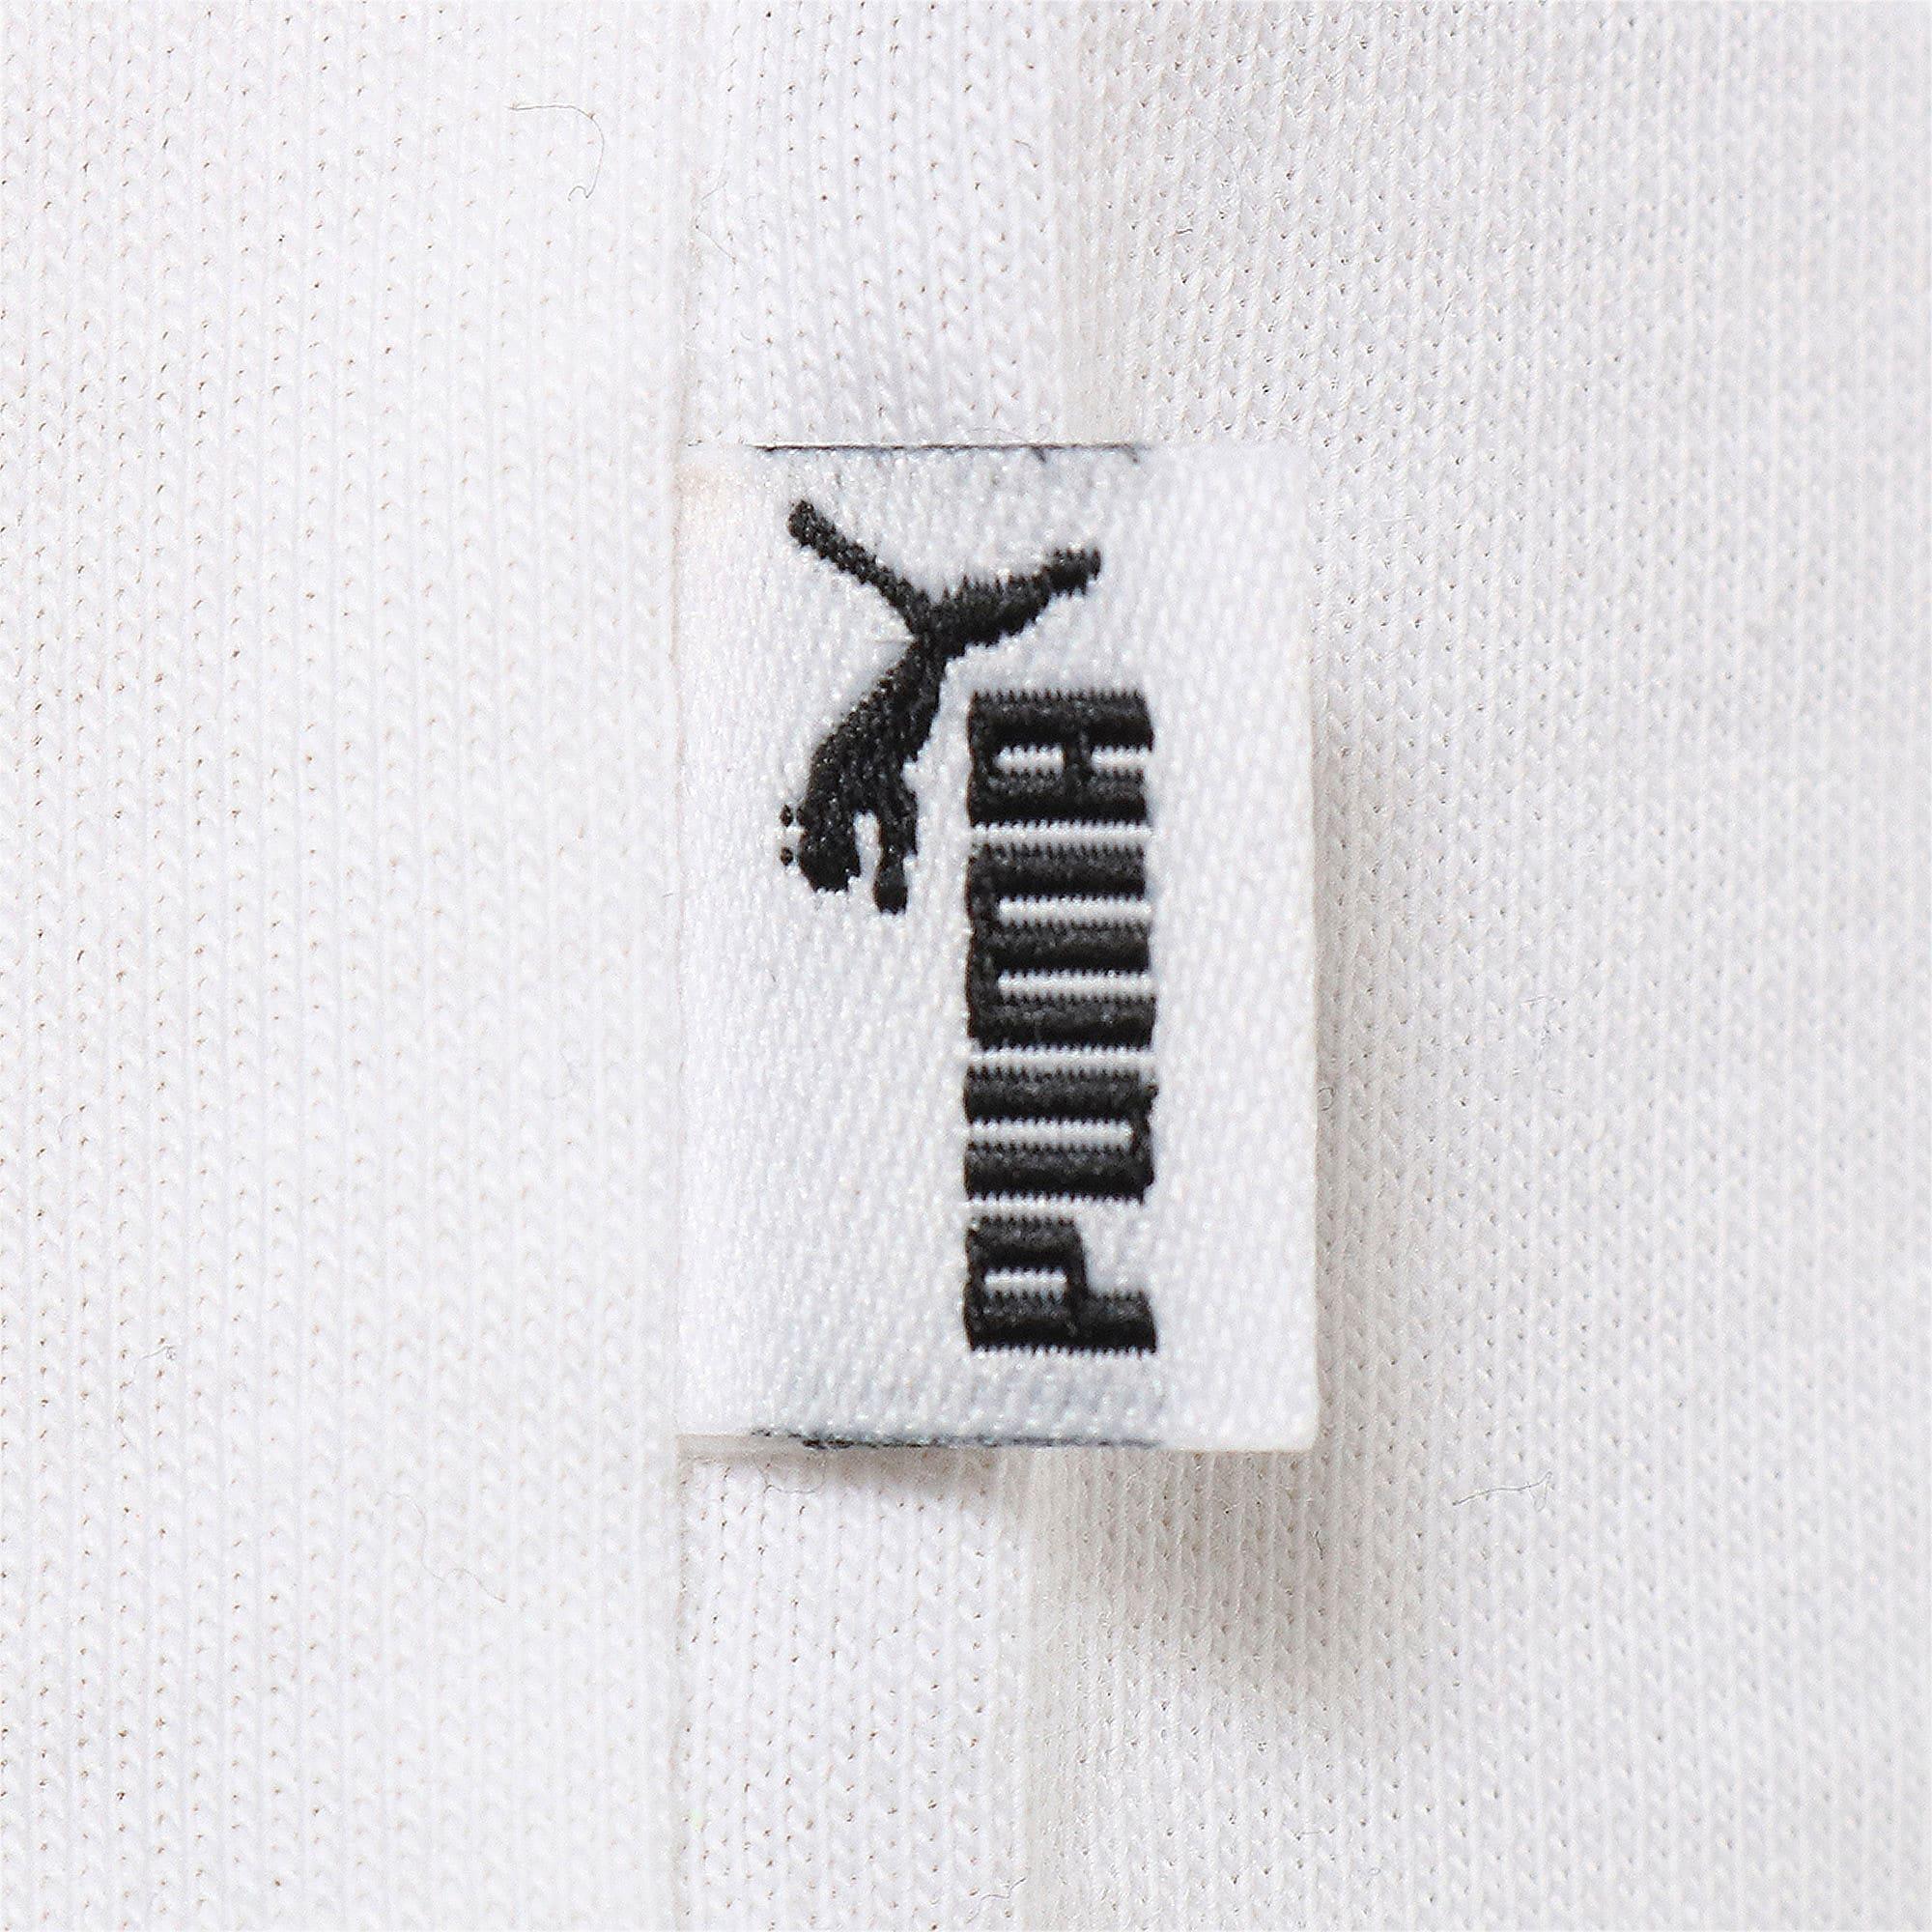 Thumbnail 8 of キッズ シティー 半袖 Tシャツ TOKYO 東京, Puma White, medium-JPN